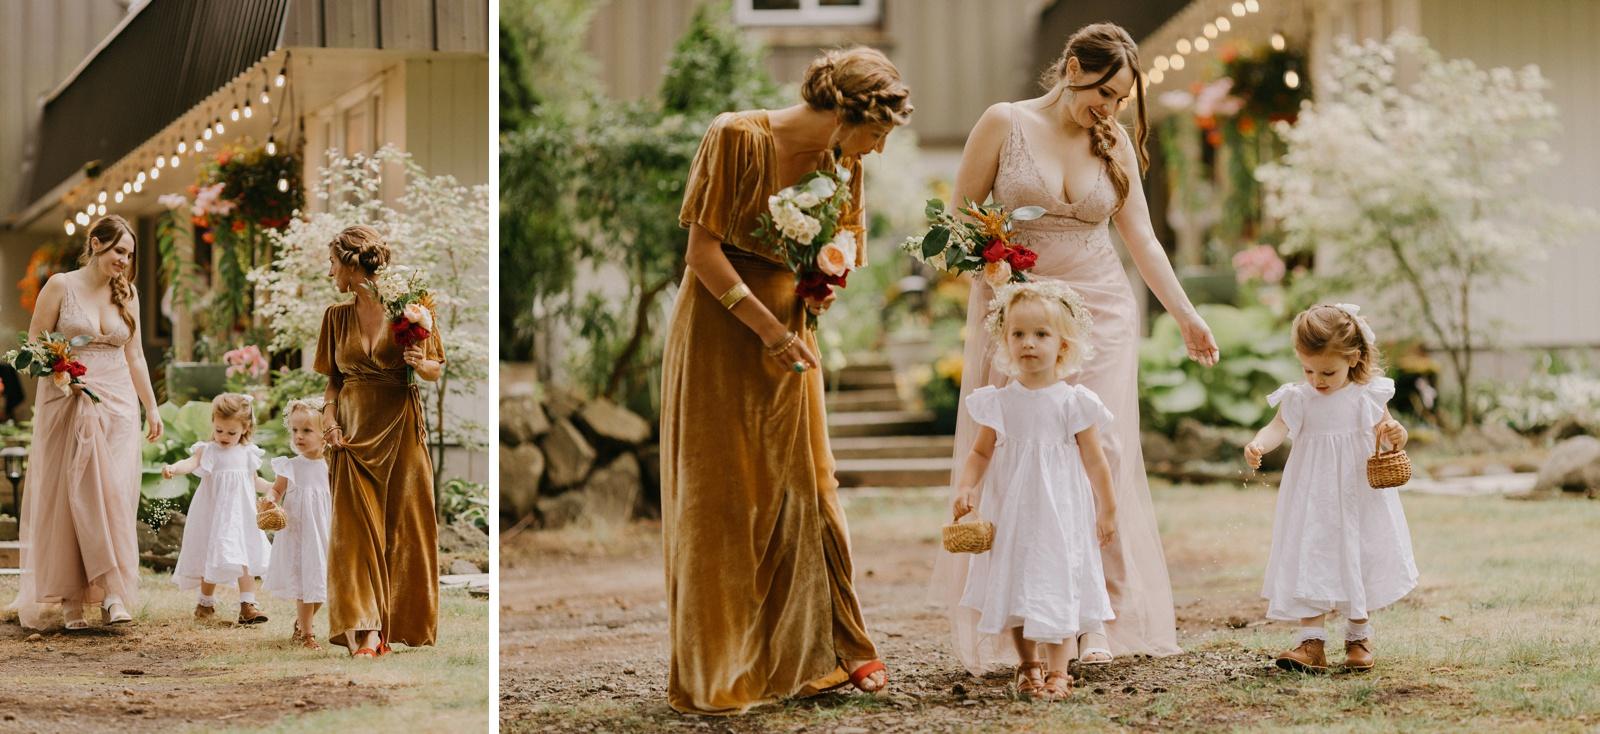 Matthew and Autumn Intimate Outdoor Backyard Wedding_0104